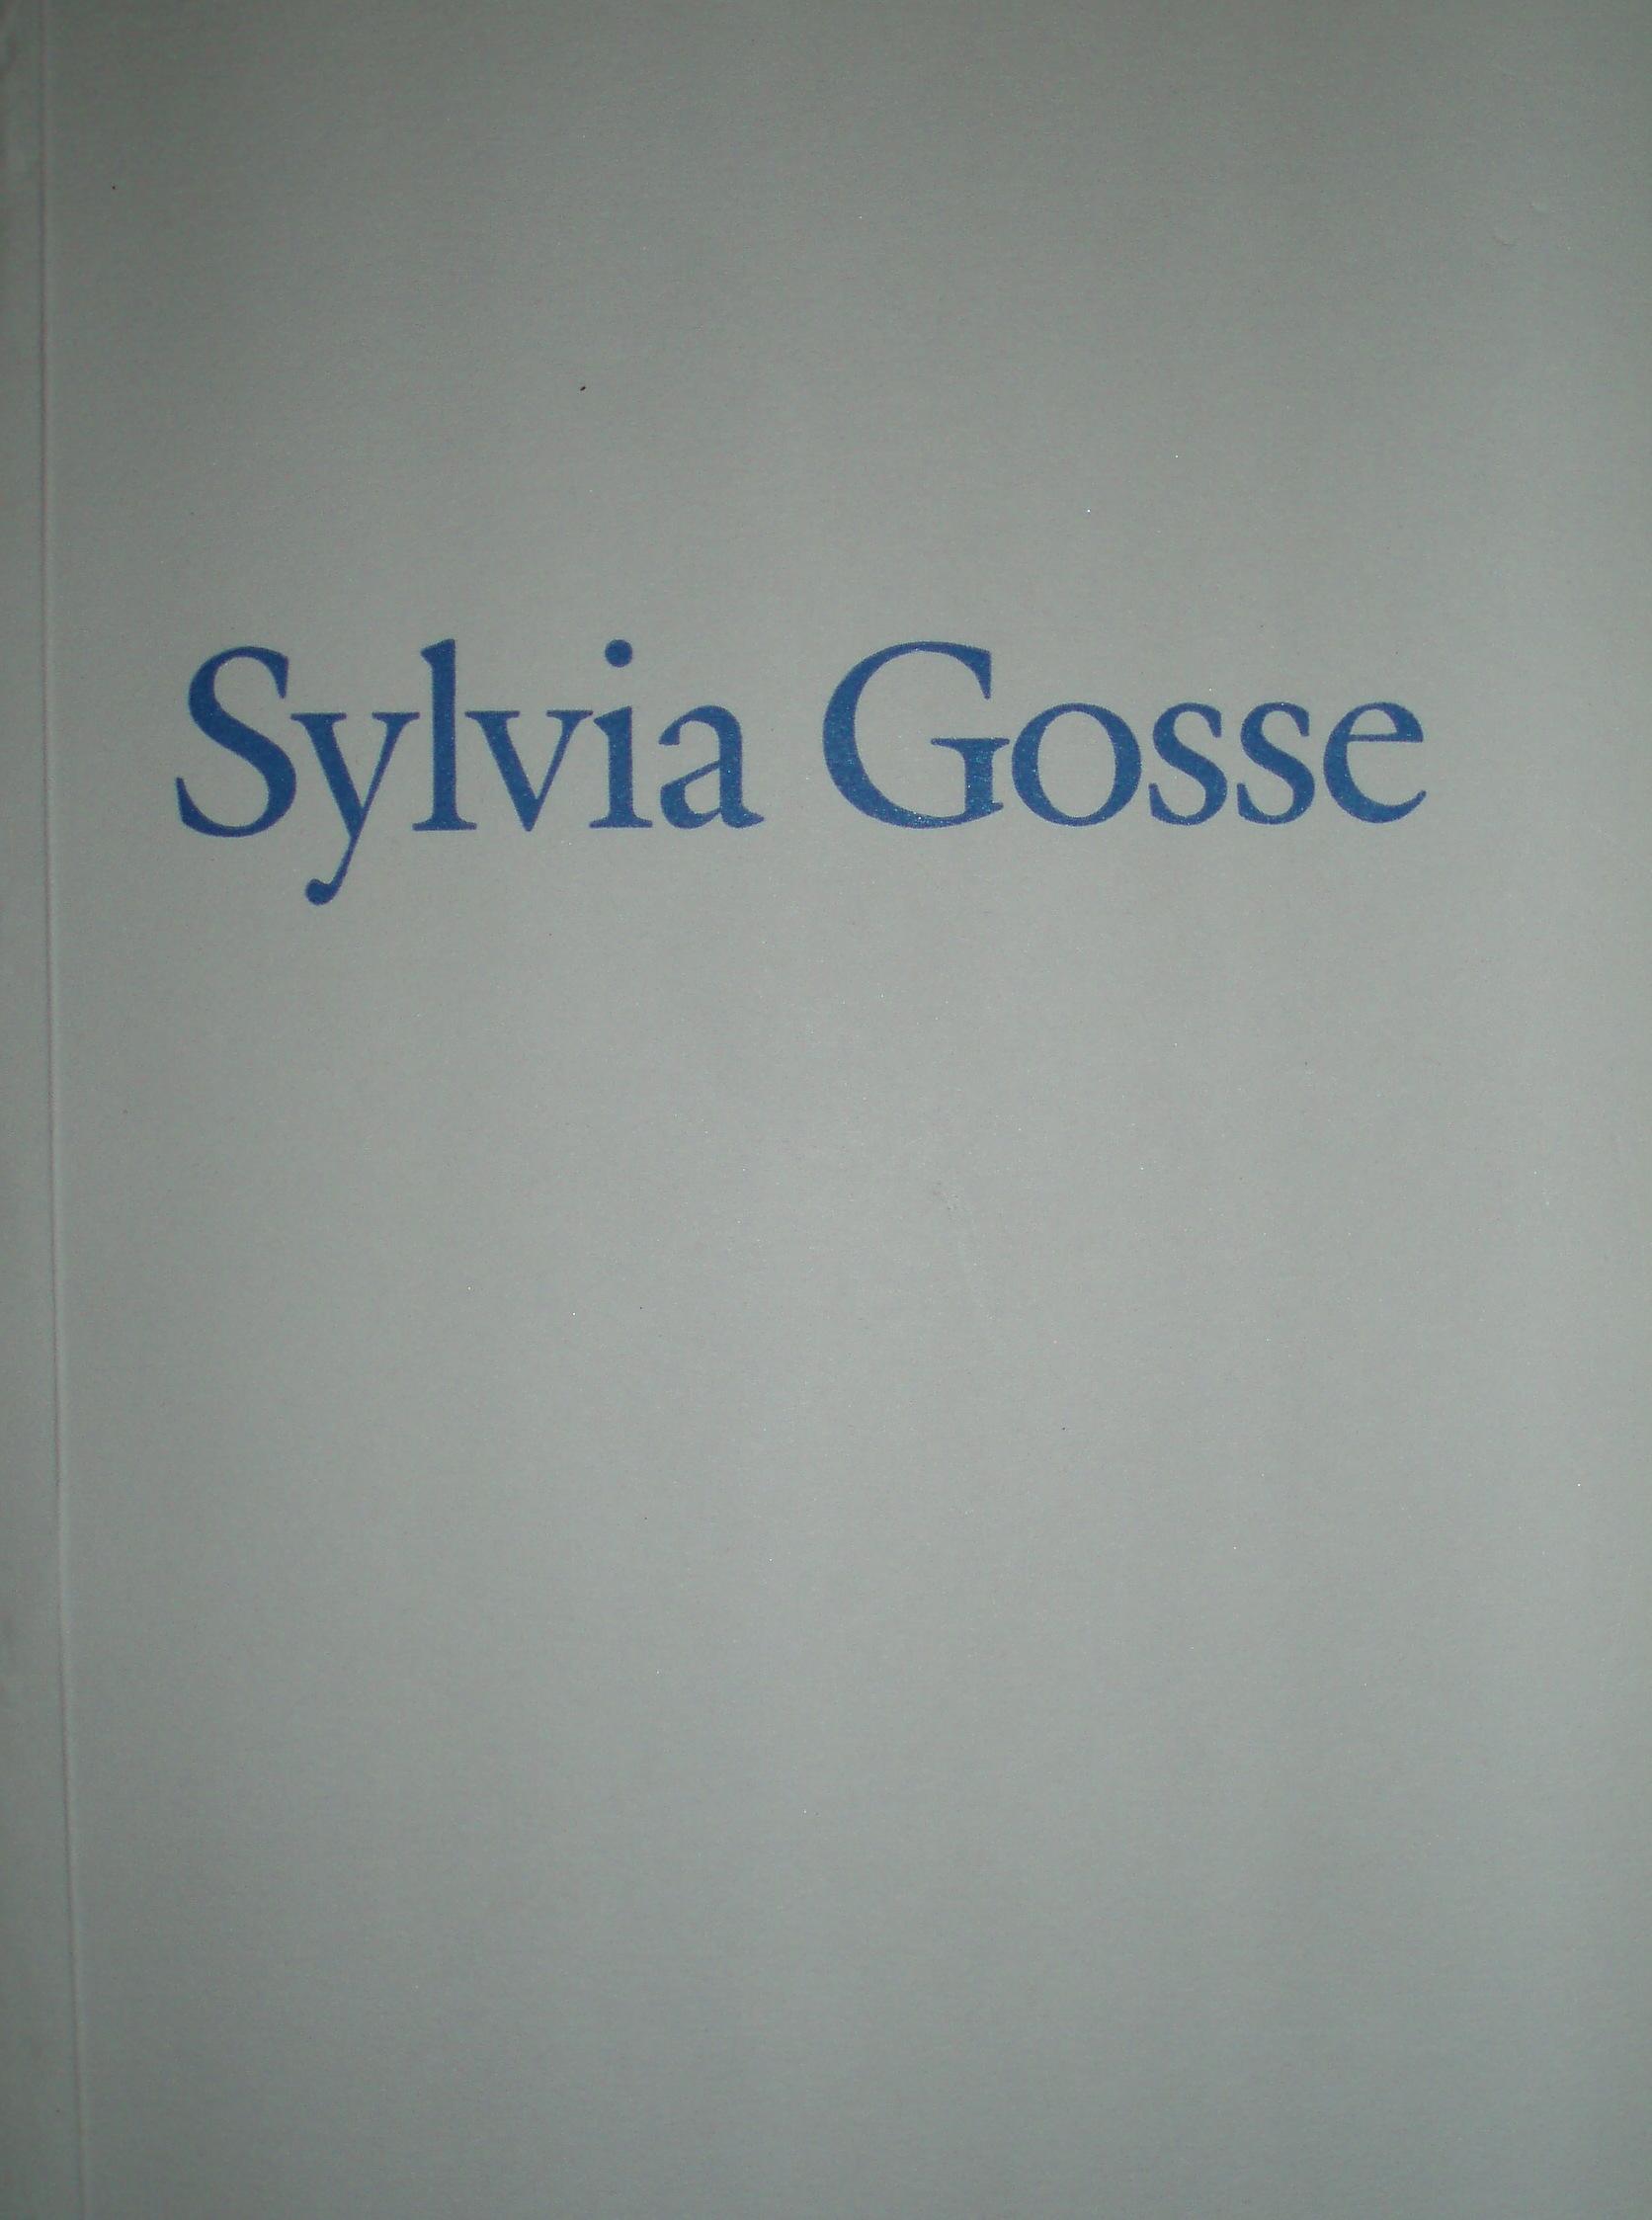 Sylvia Gosse